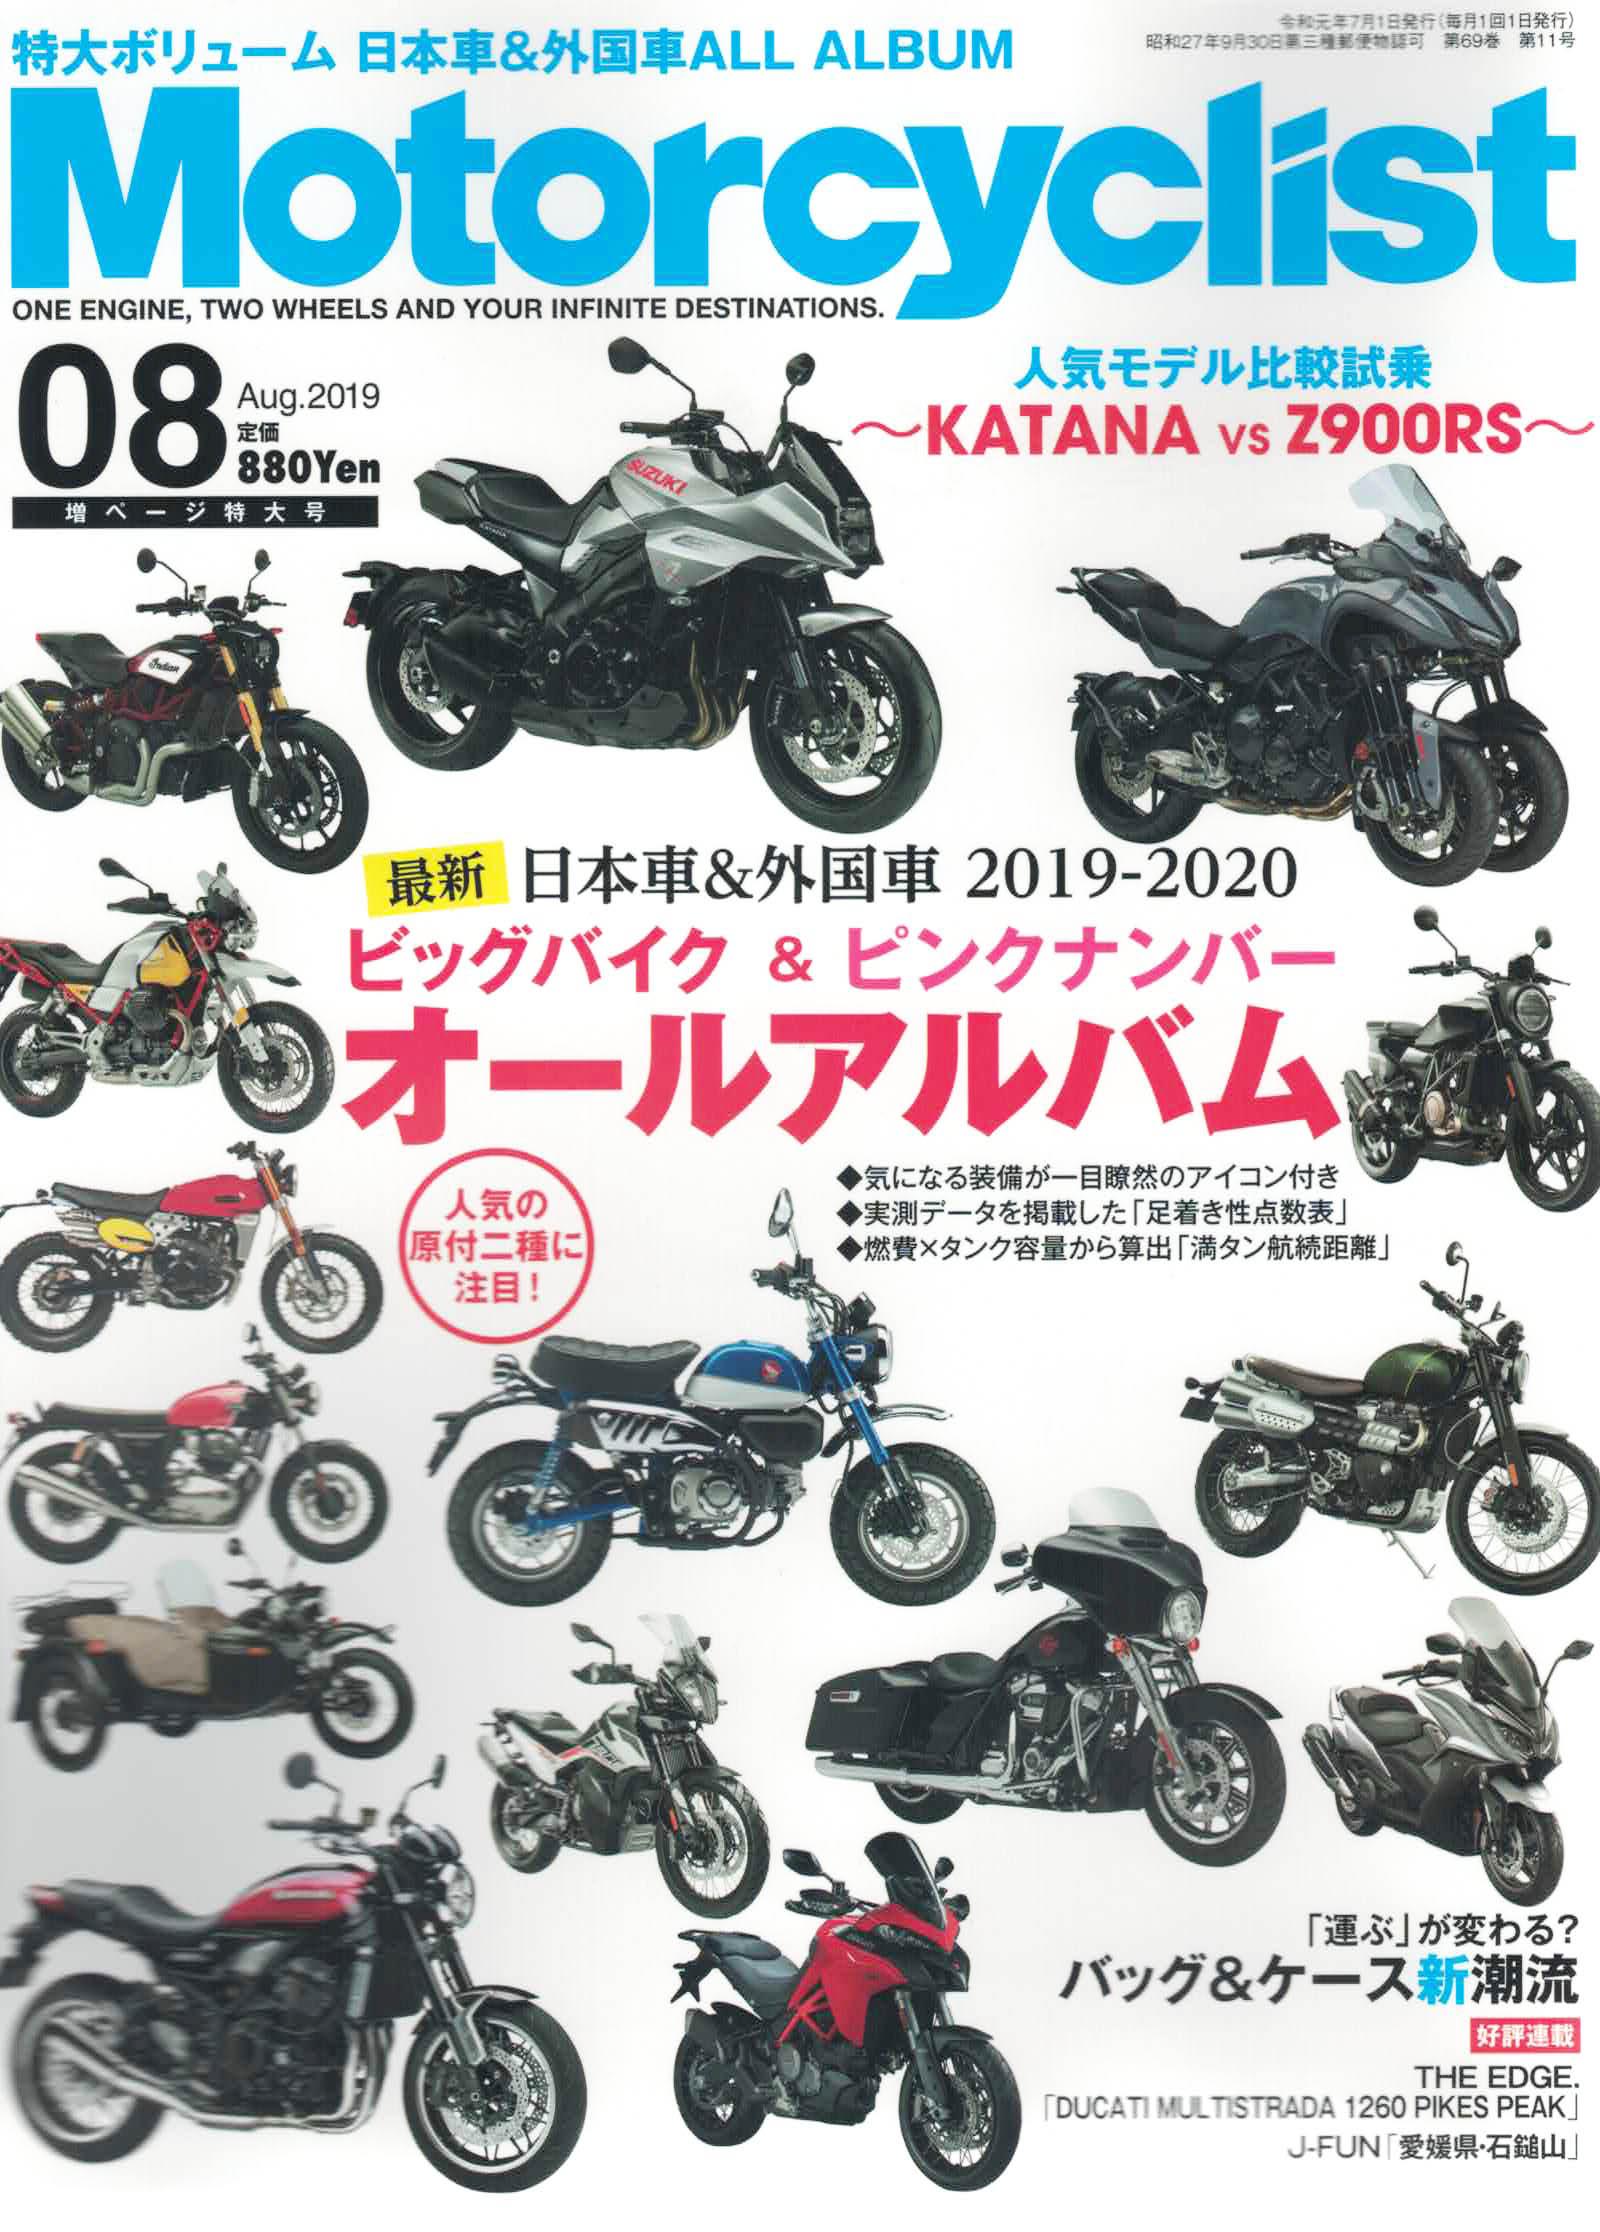 【Motorcyclist8月号掲載】FANTIC CABALLERO SCRAMBLER、CABALLERO FLAT TRACK